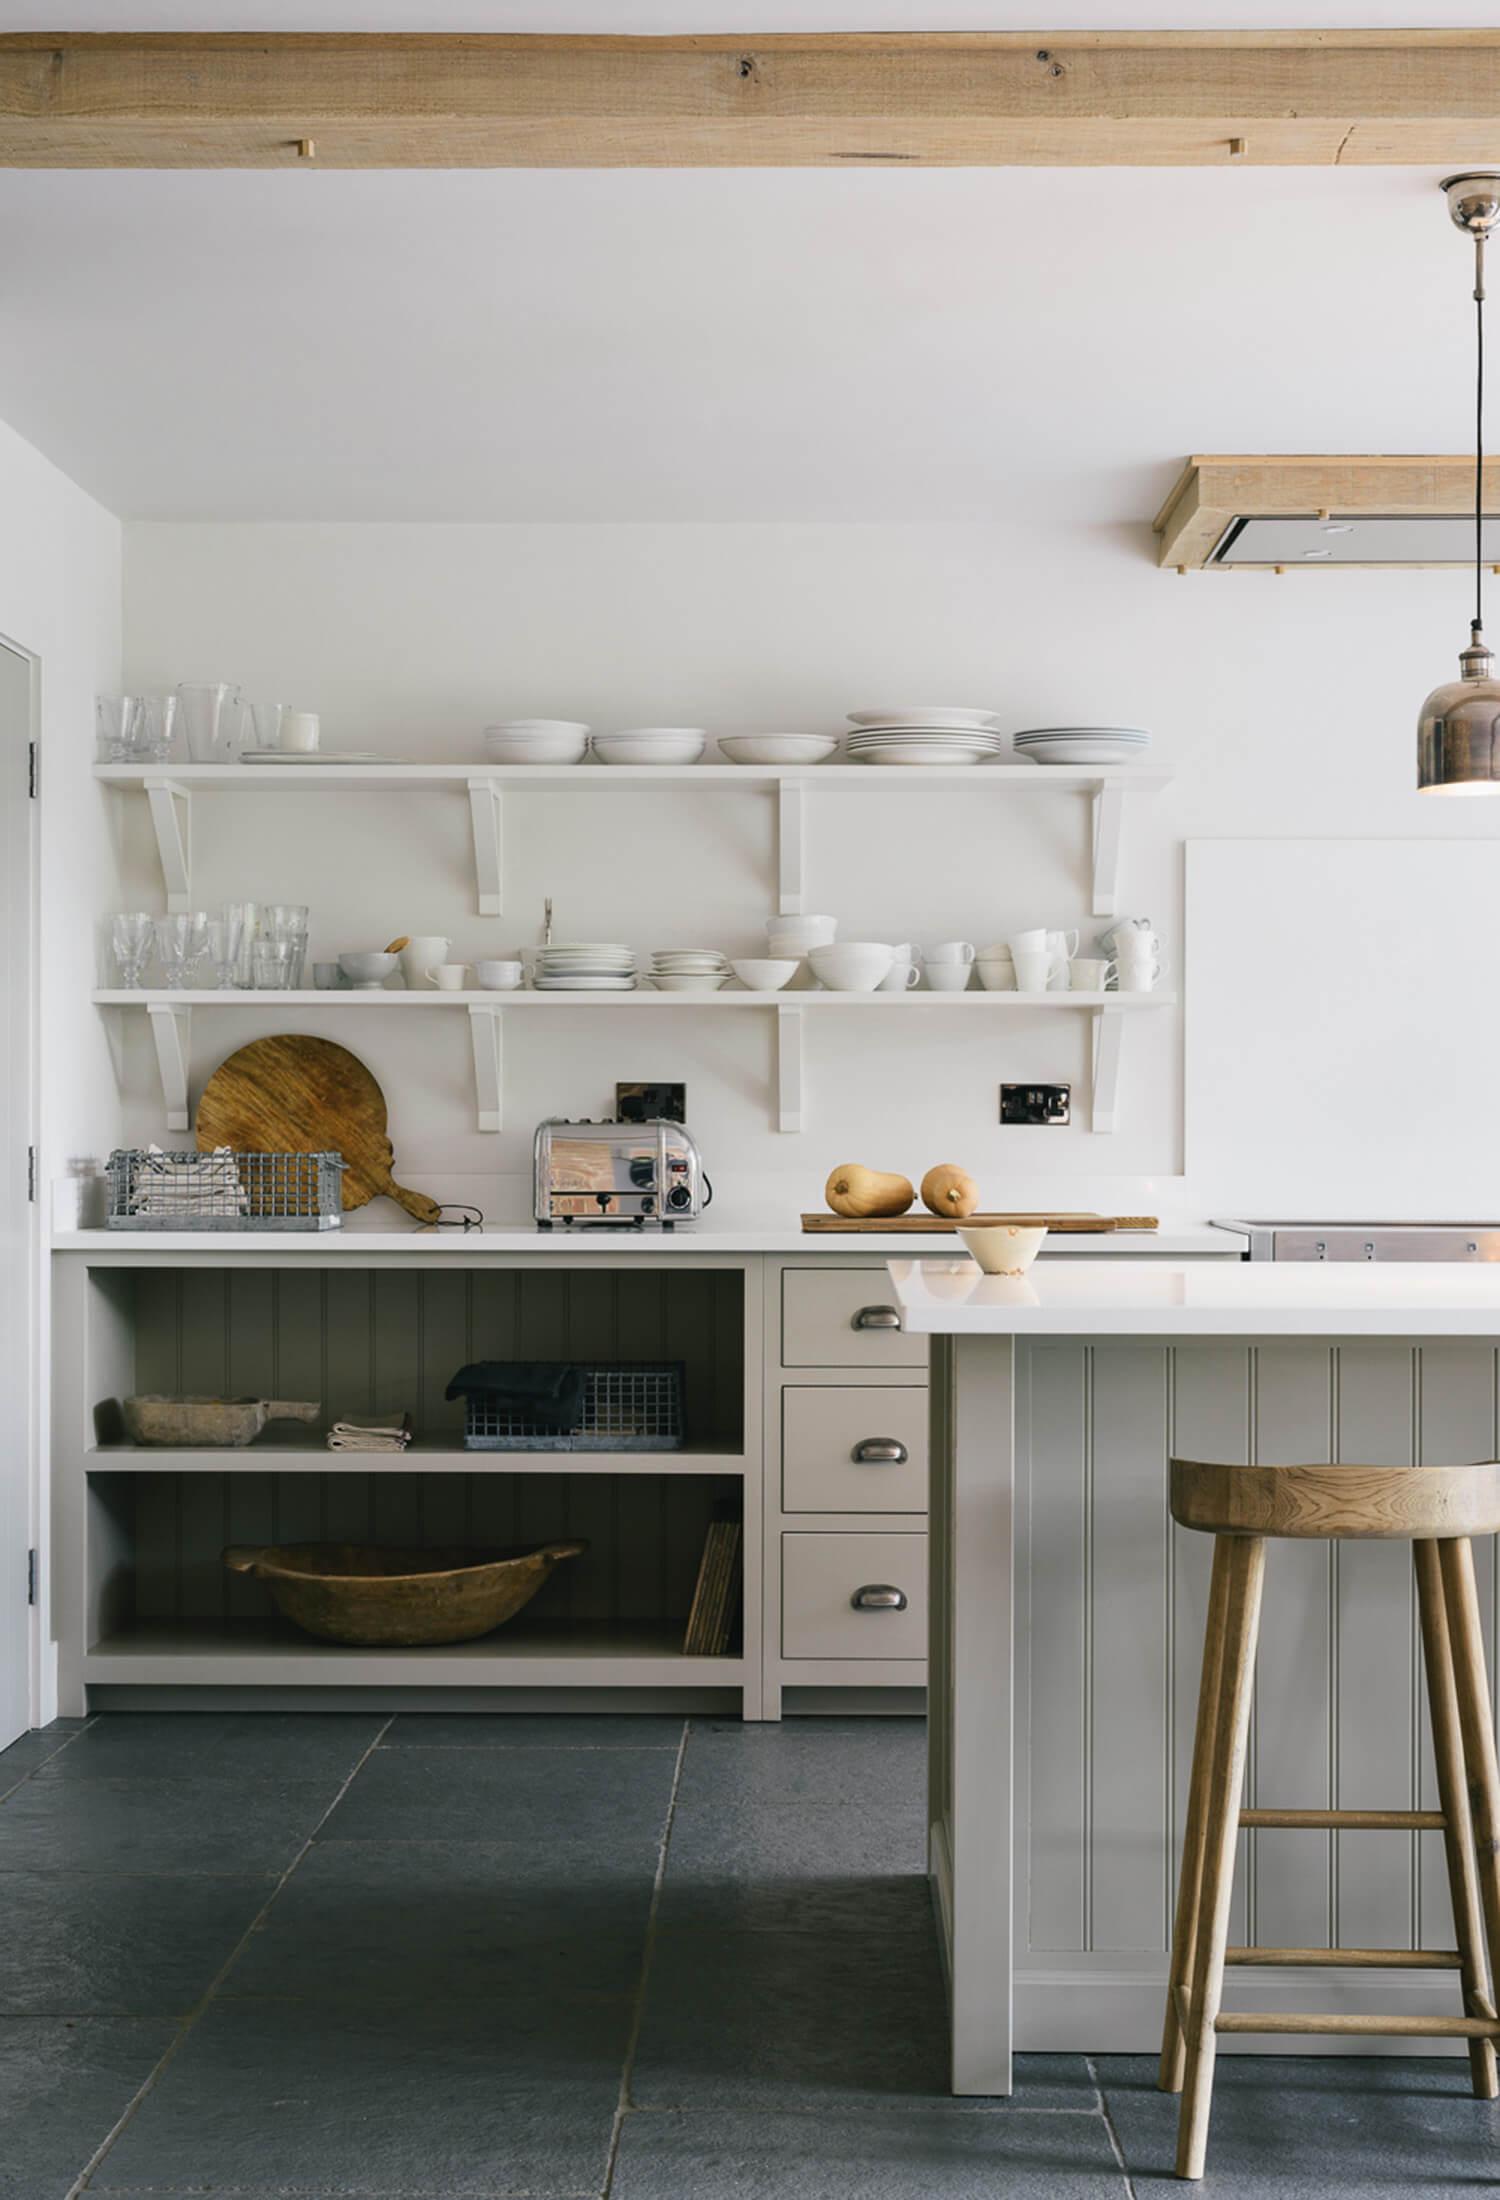 Designer Kitchens Potters Bar Devol Kitchens Opening Times 03150120170518 Ponyiexnet